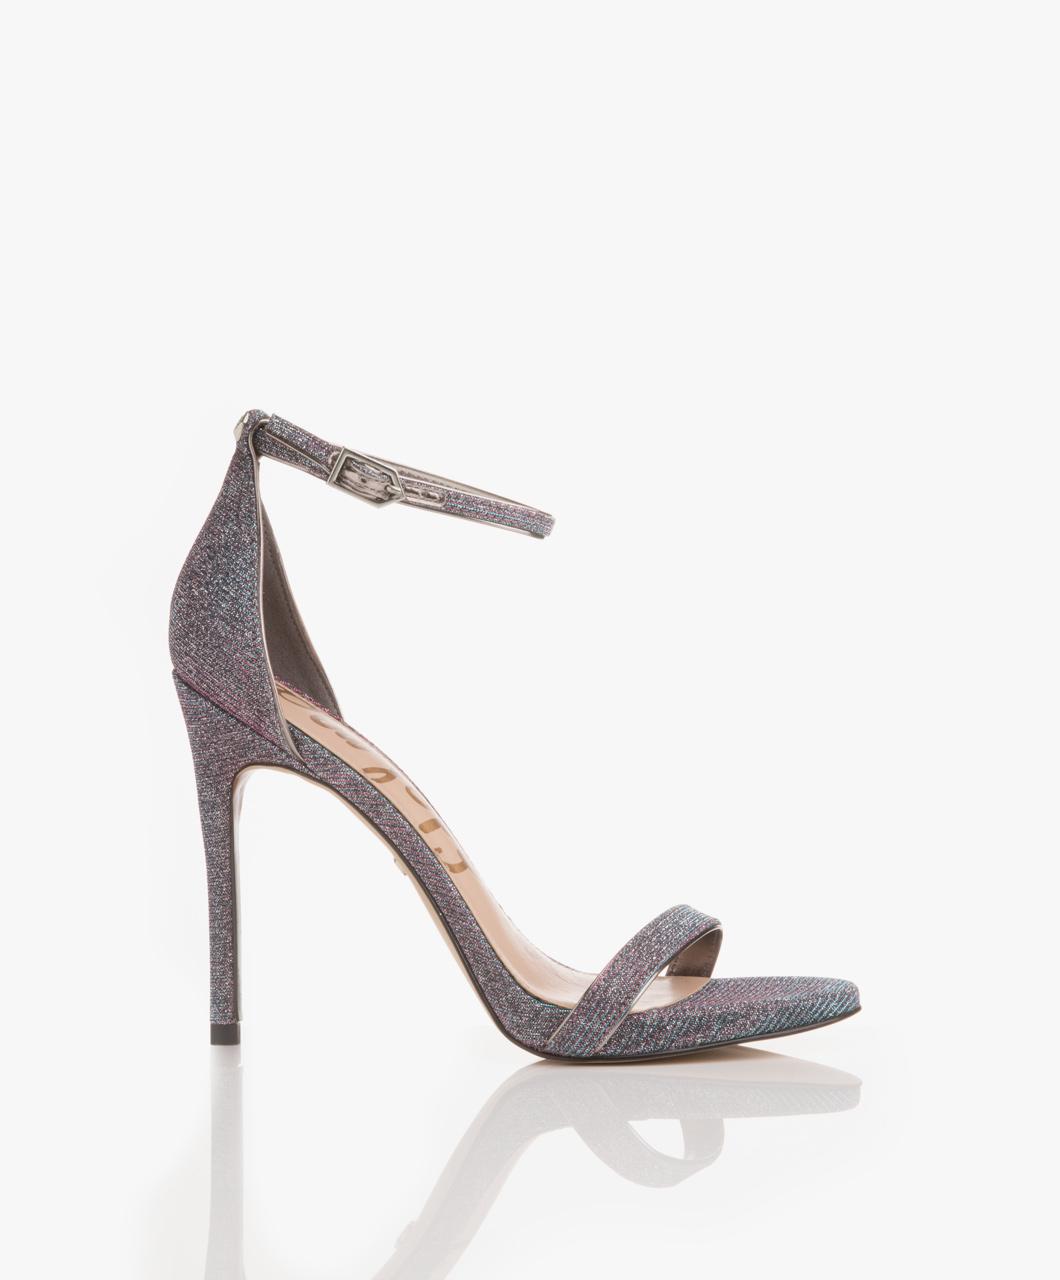 26c72a3adca Sam Edelman Ariella Flash Glitz Ankle Strap Sandals - Pink Blue Multi -  ariella pink  multi